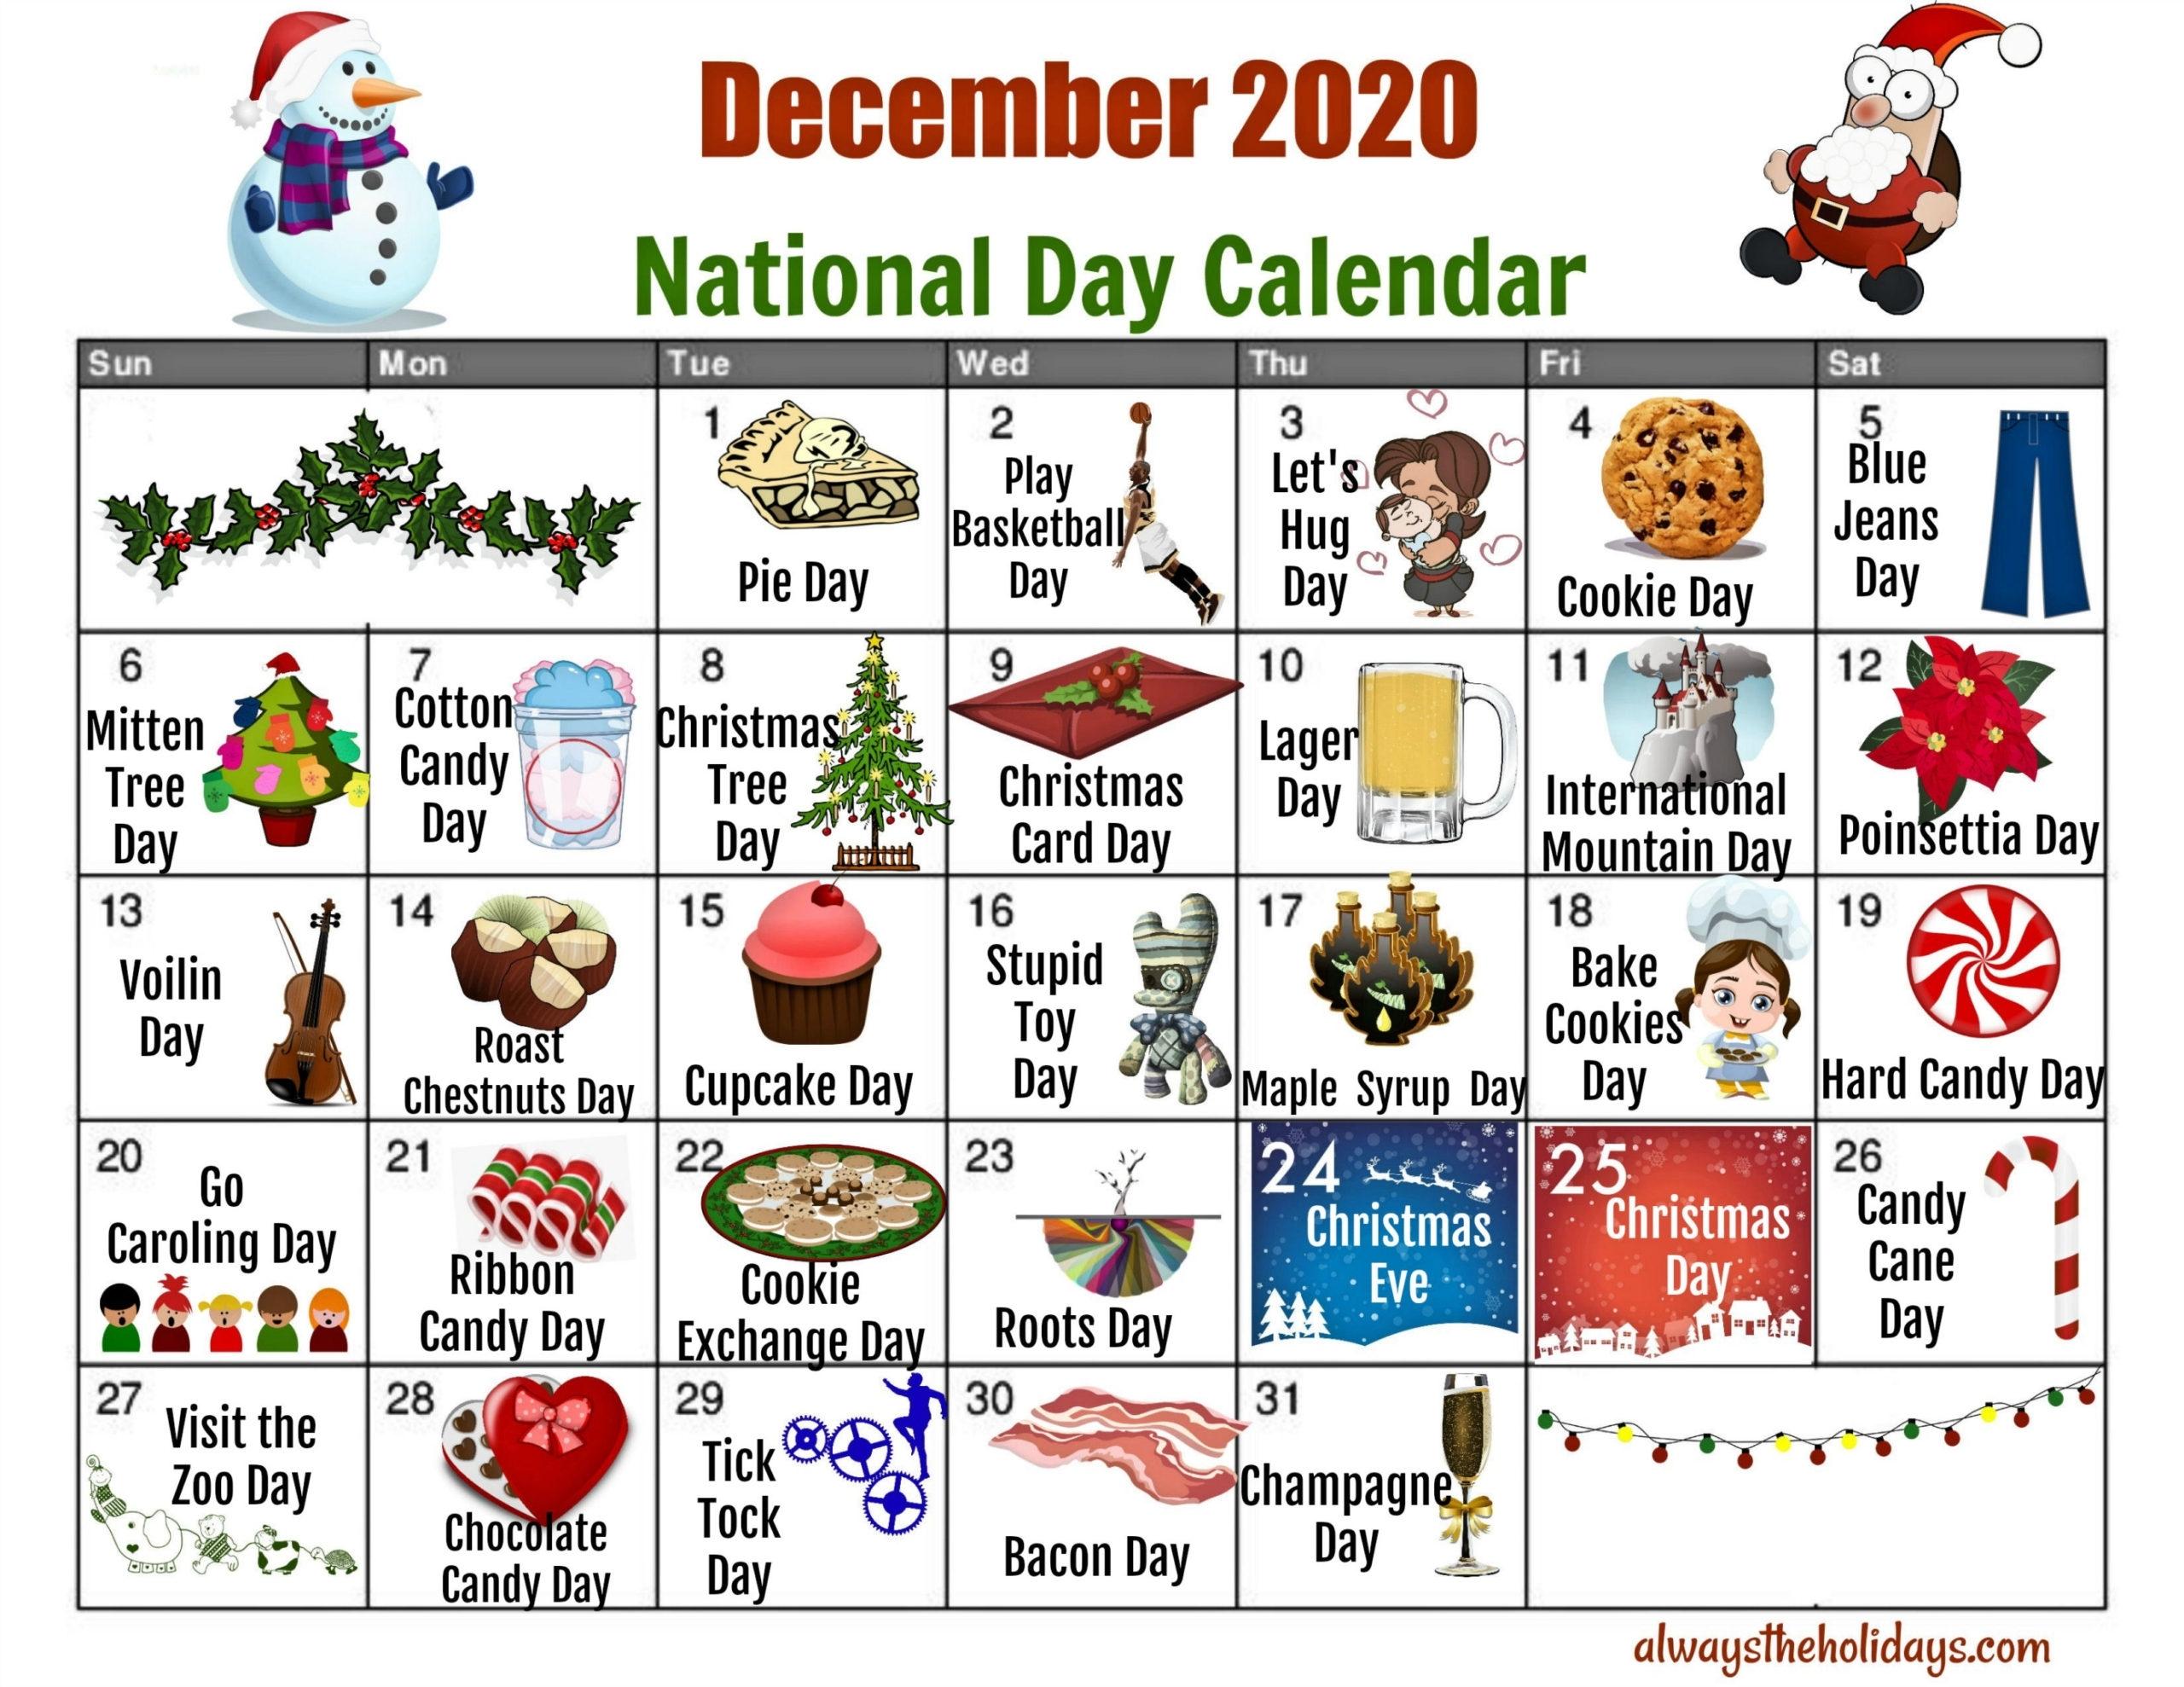 December National Day Calendar - Free Printable Calendars